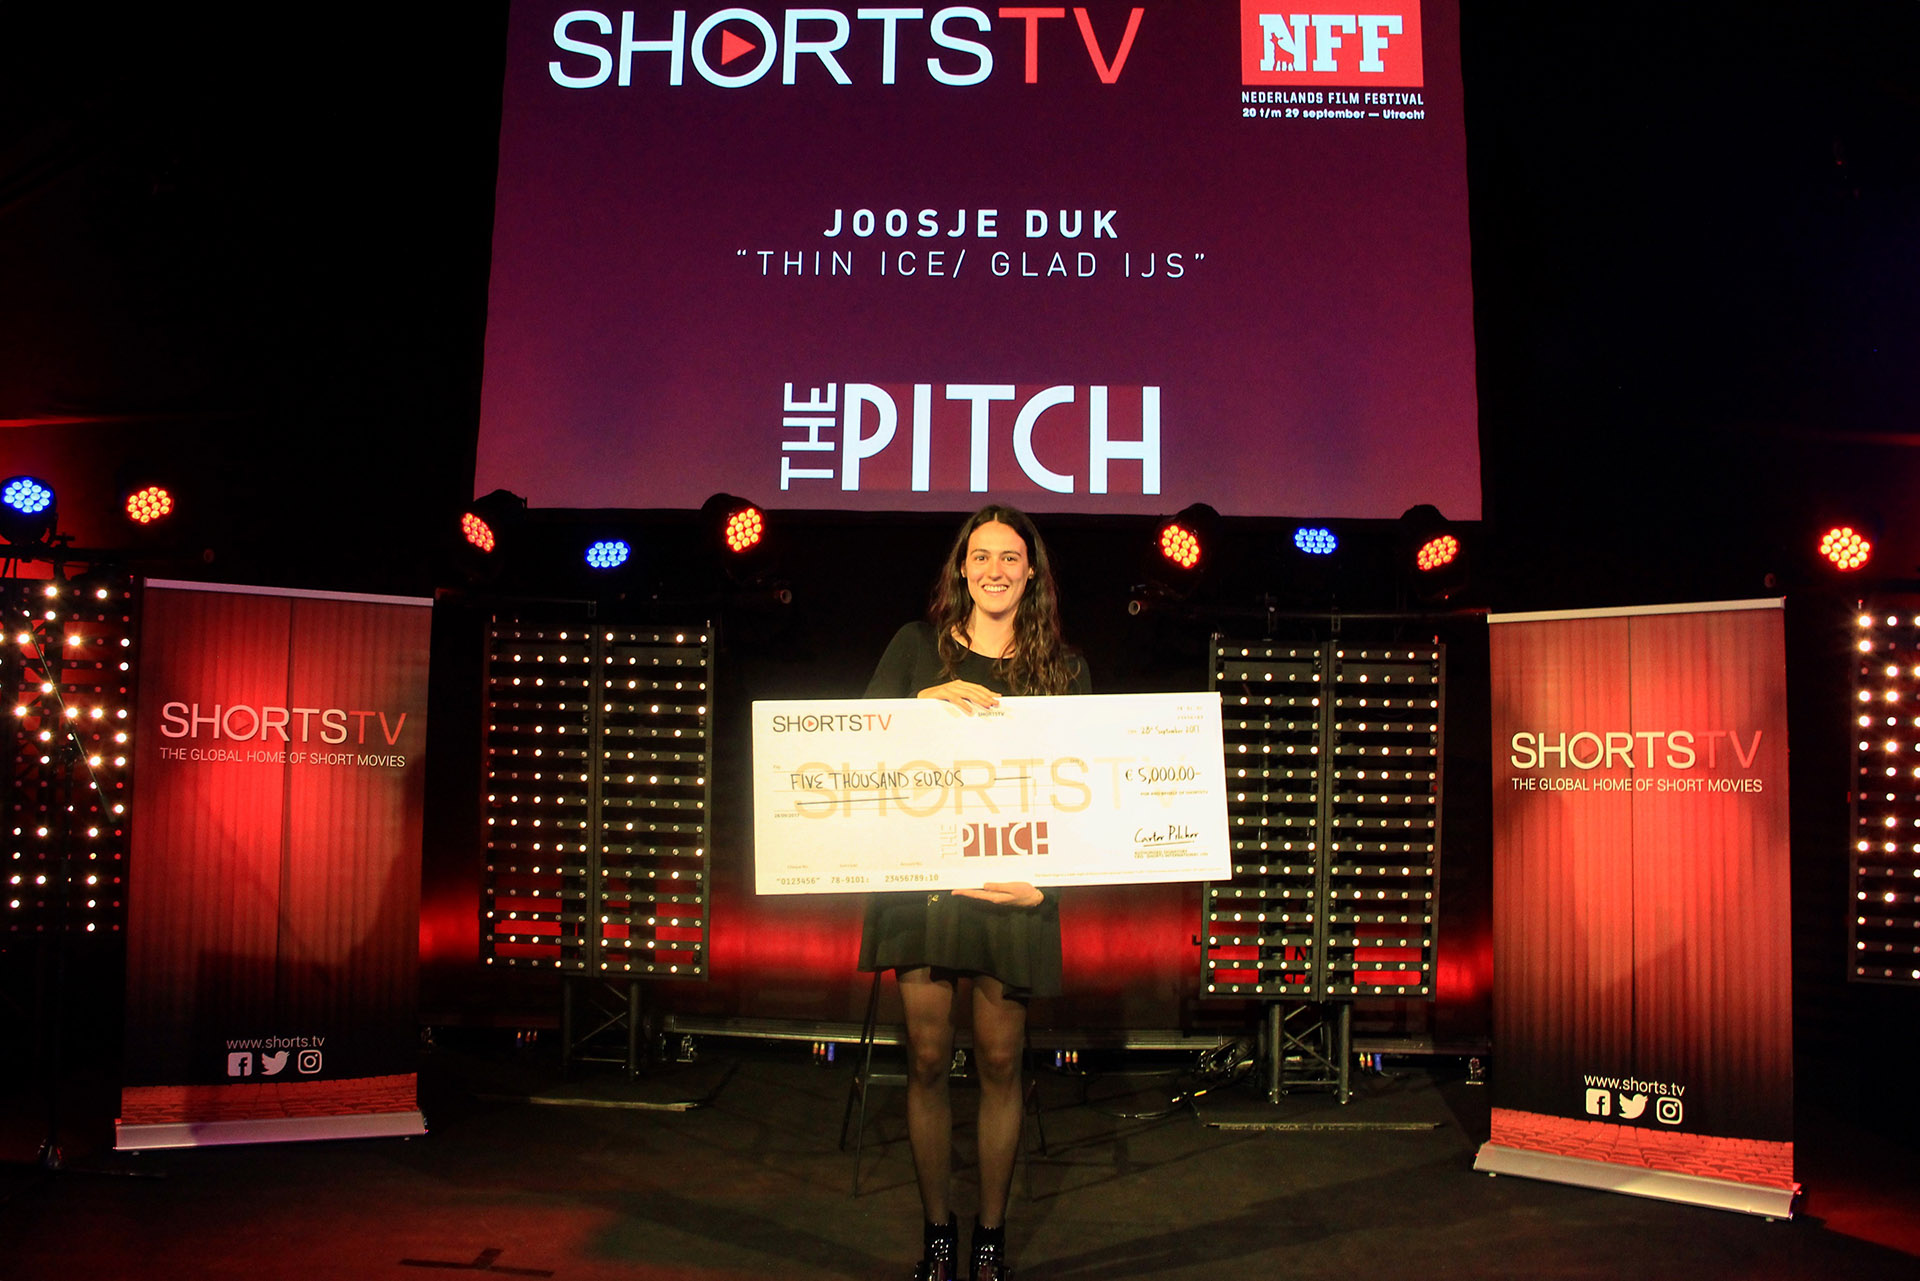 The Pitch - Netherlands Film Festival 2017